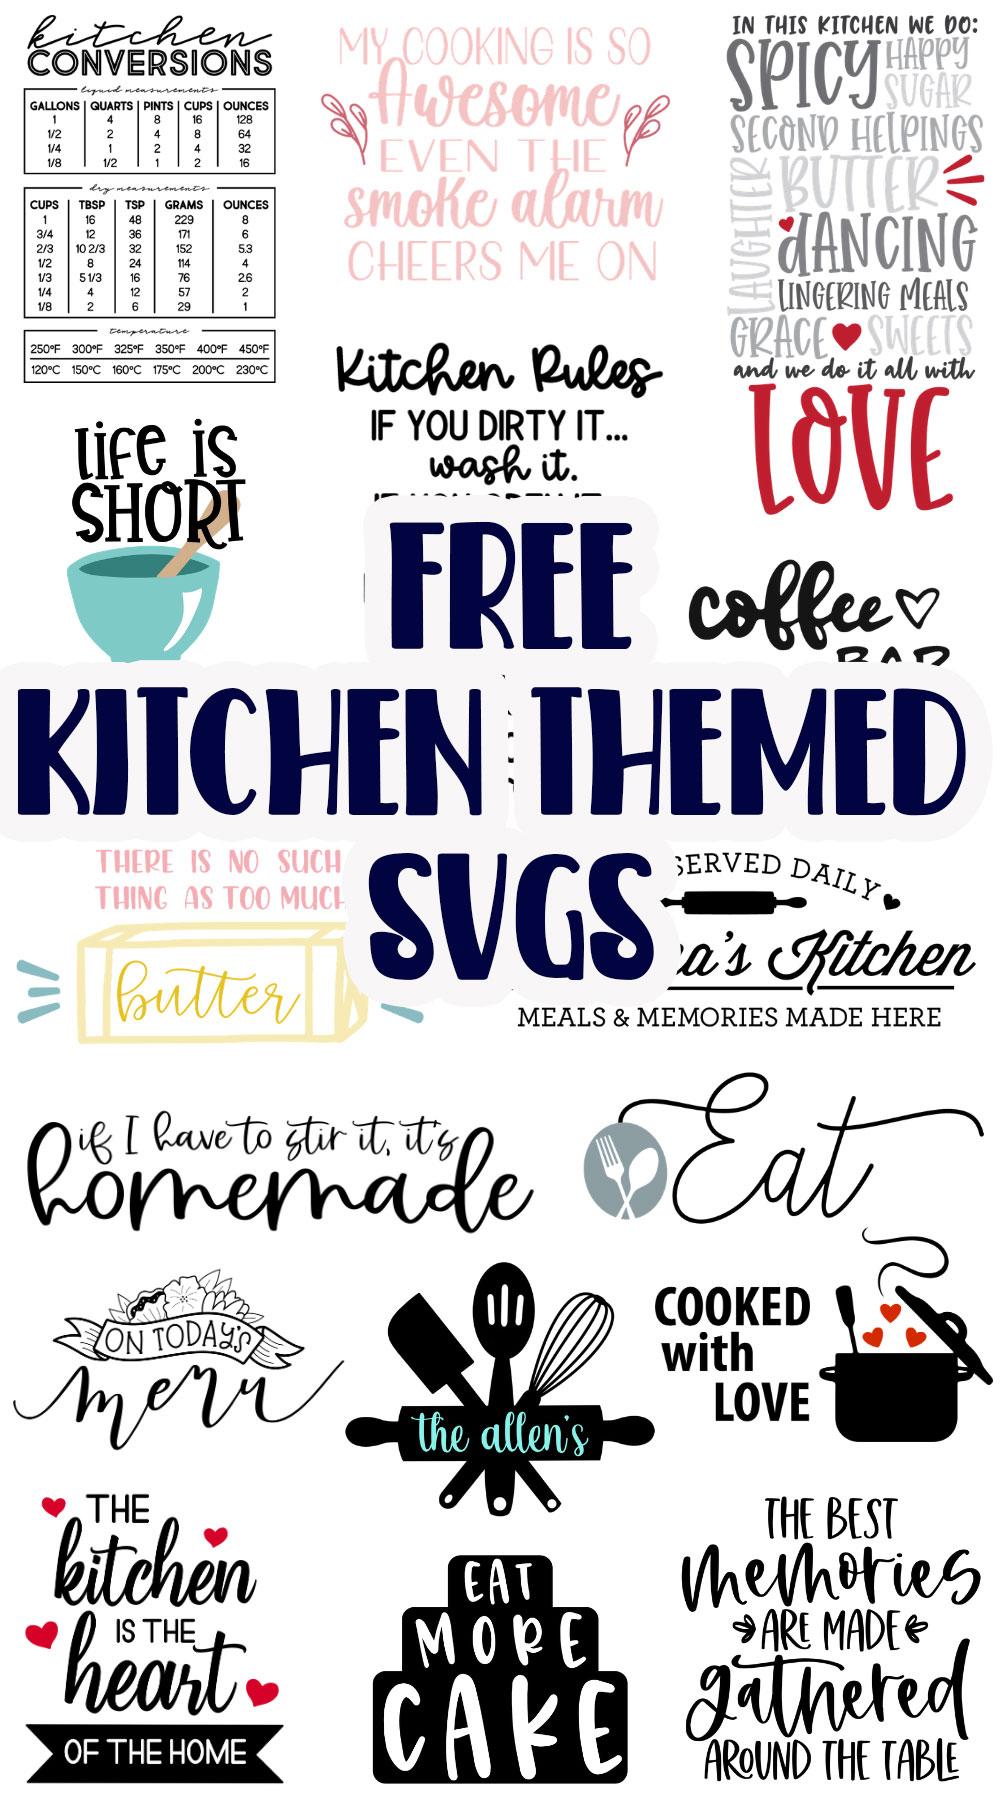 Kitchen Themed SVG files FREE - Life Sew Savory